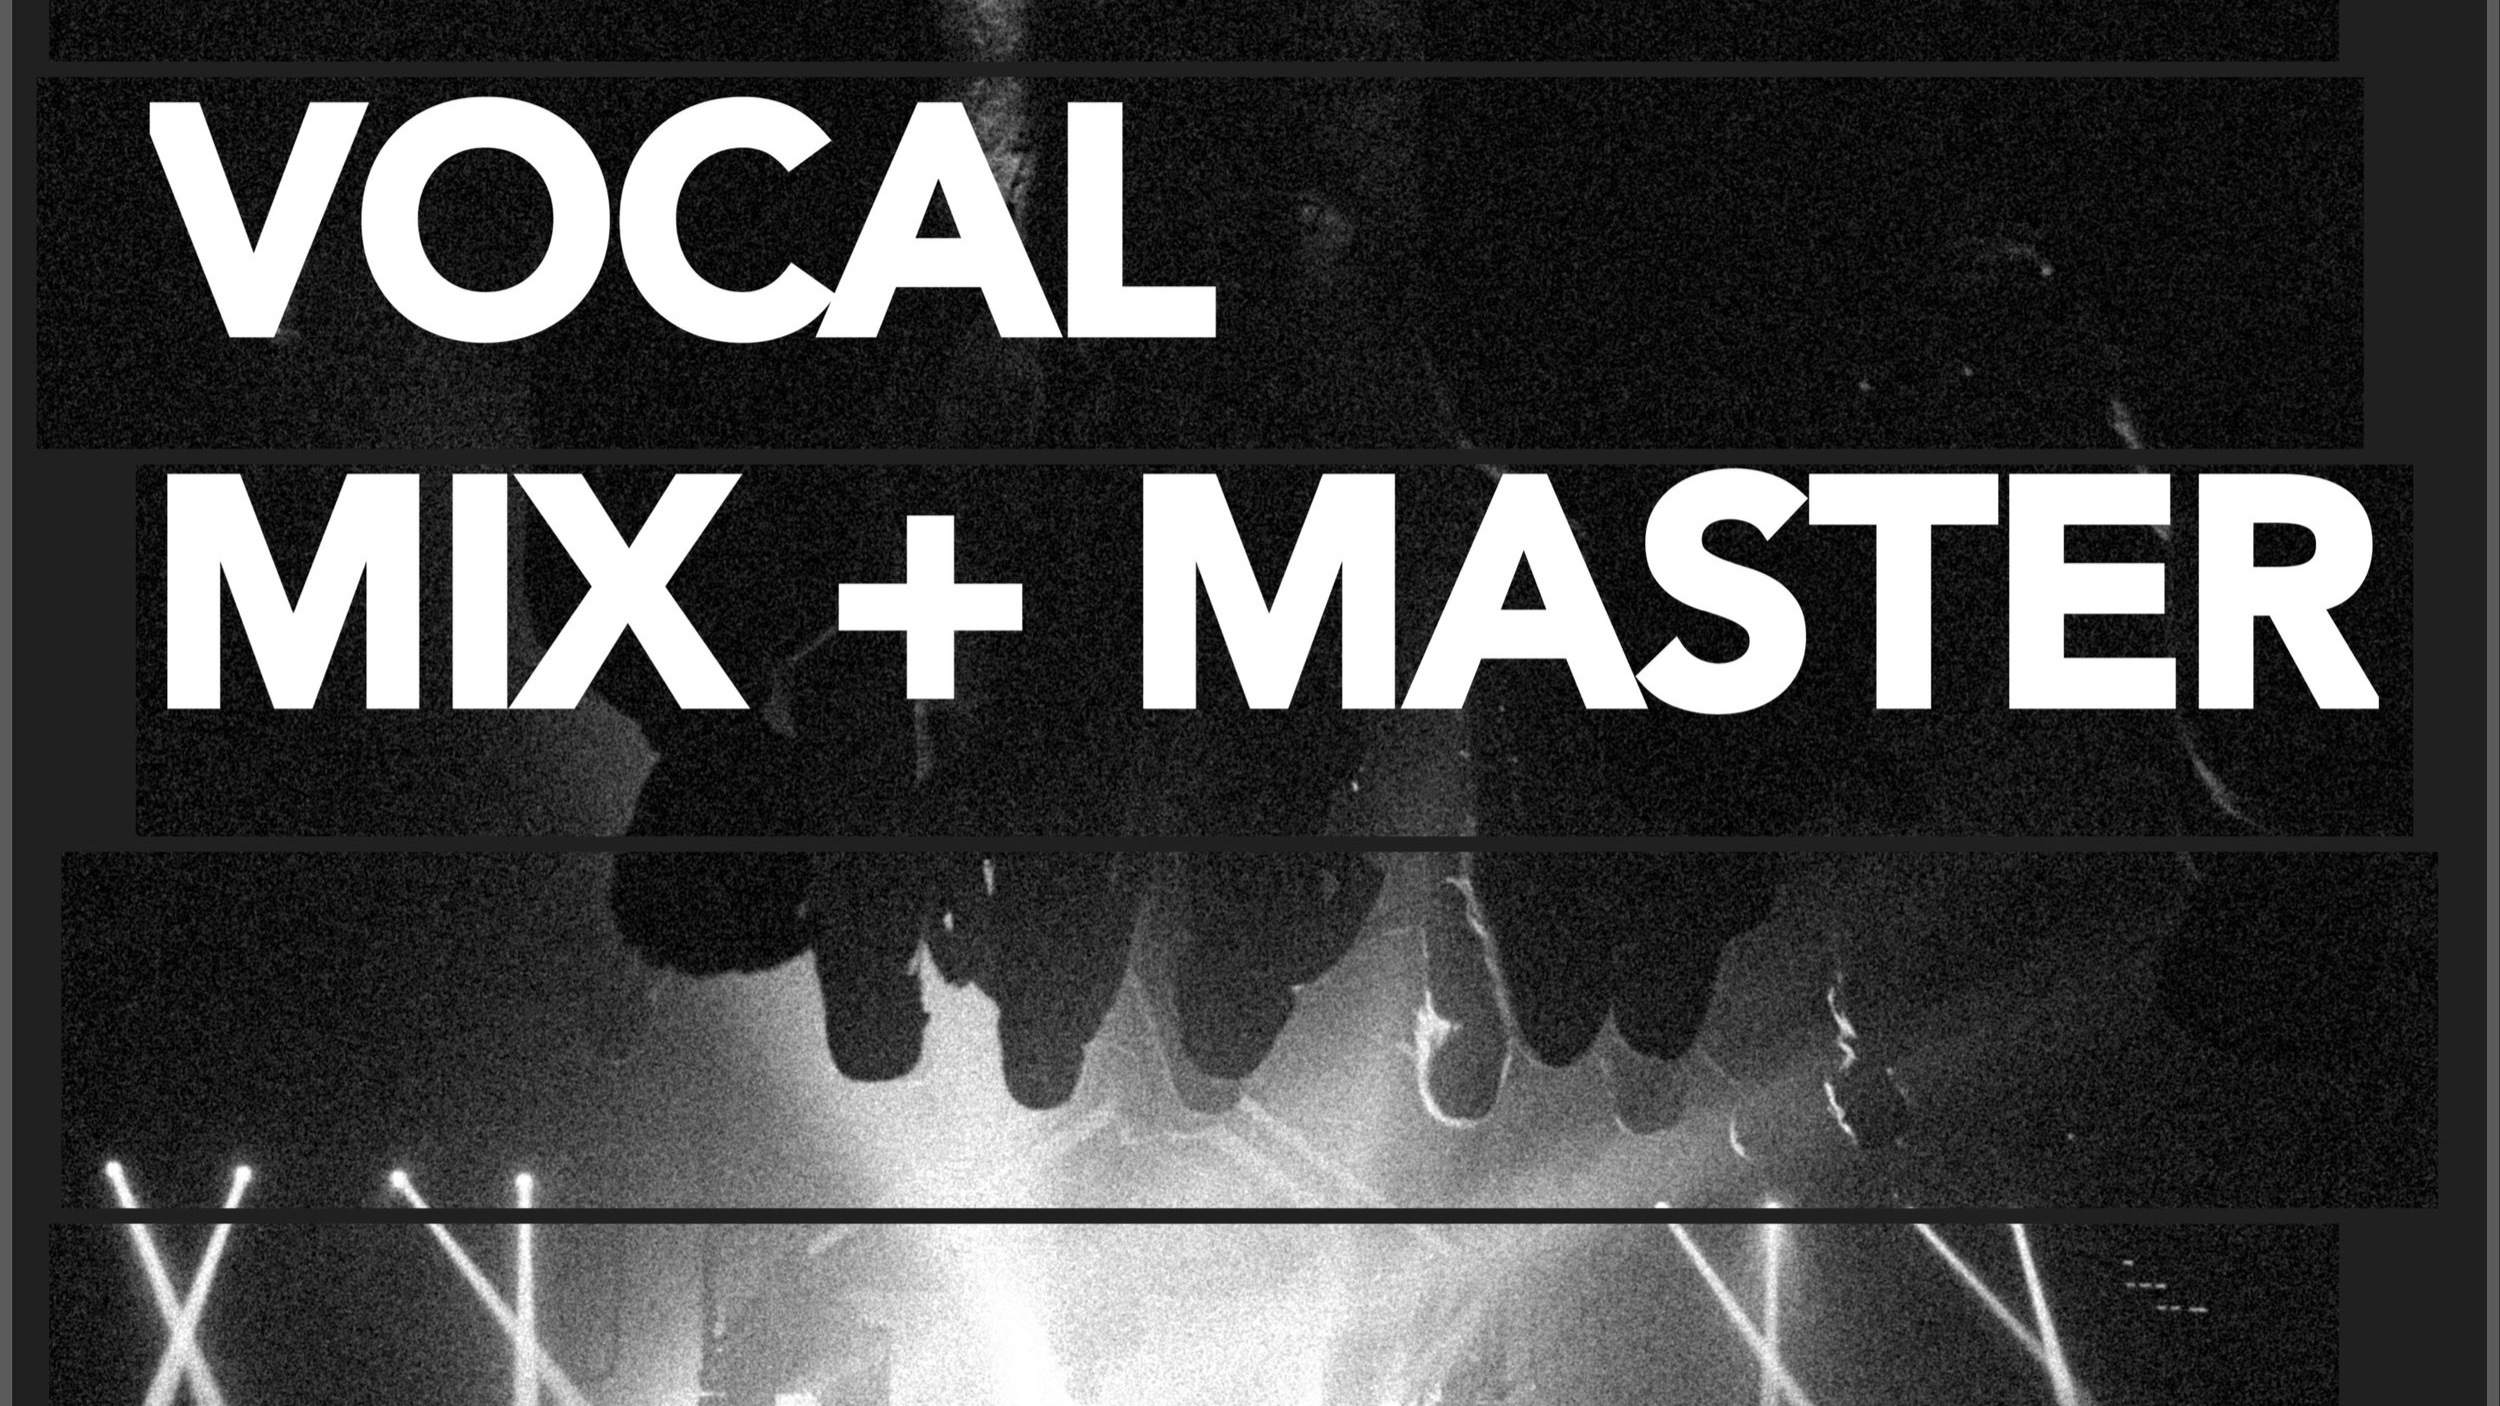 Vocal_Mix_Master.jpg